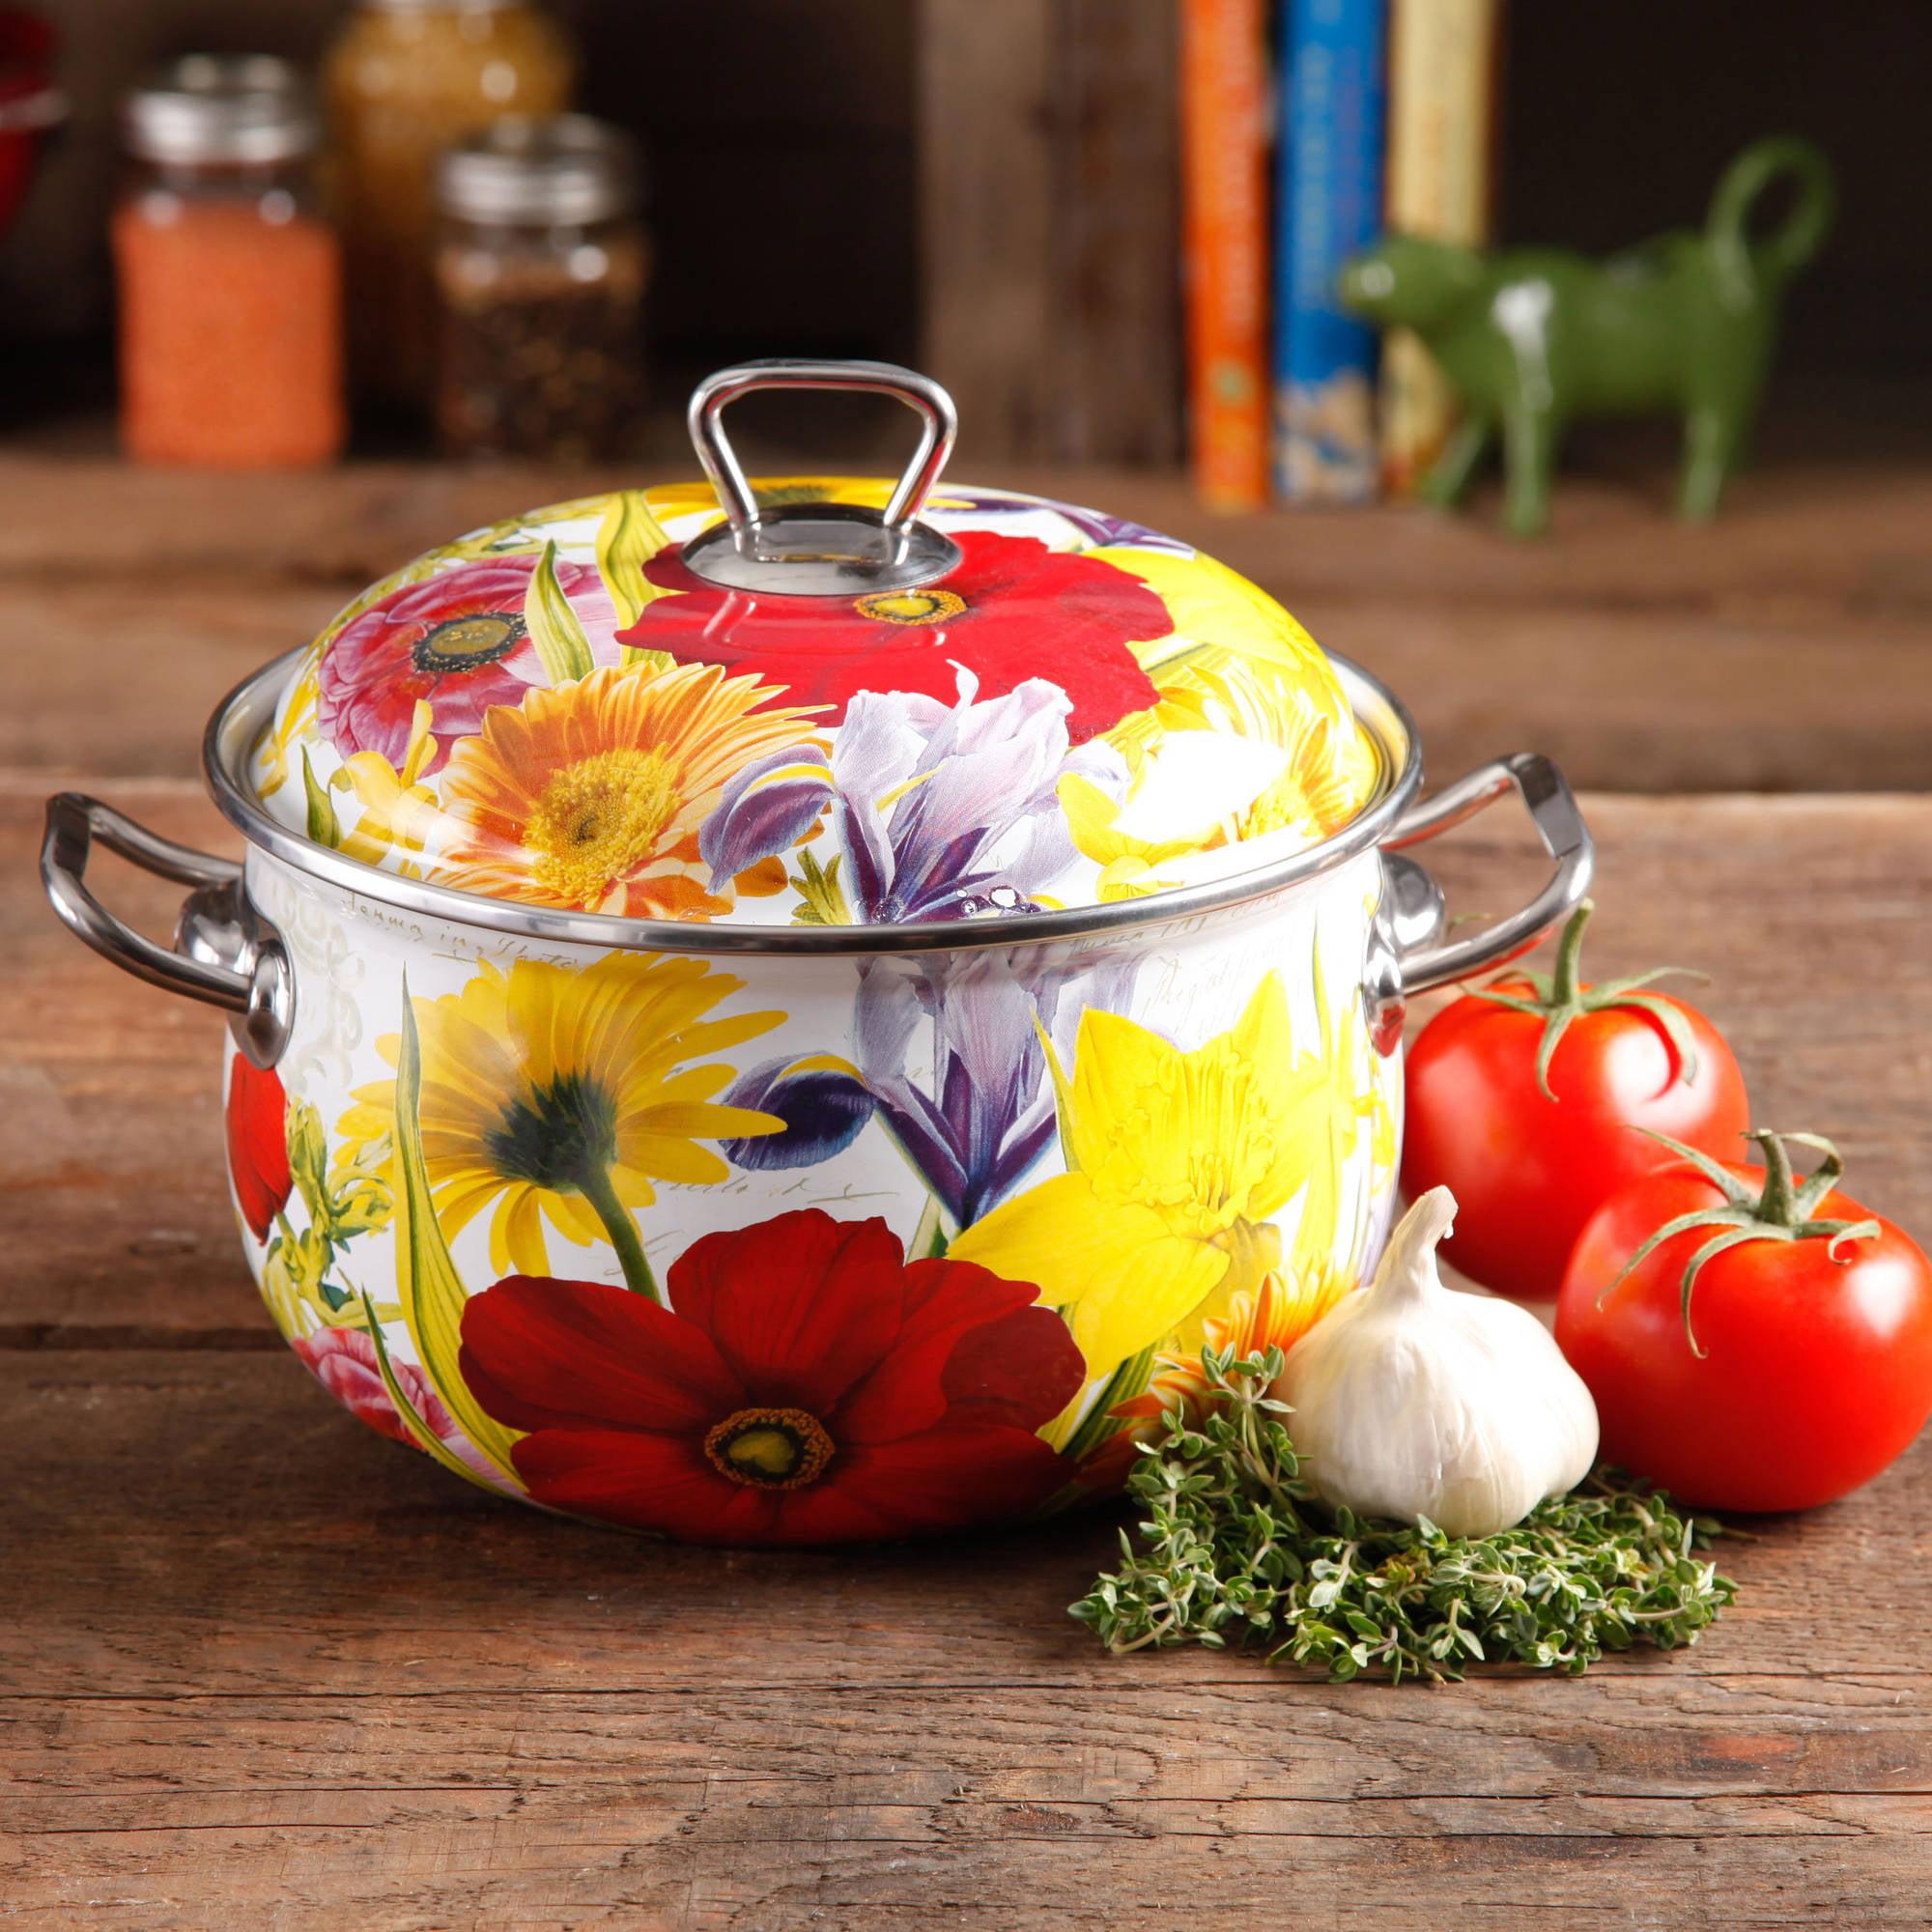 The Pioneer Woman Floral Garden 4 Quart Dutch Oven Multi